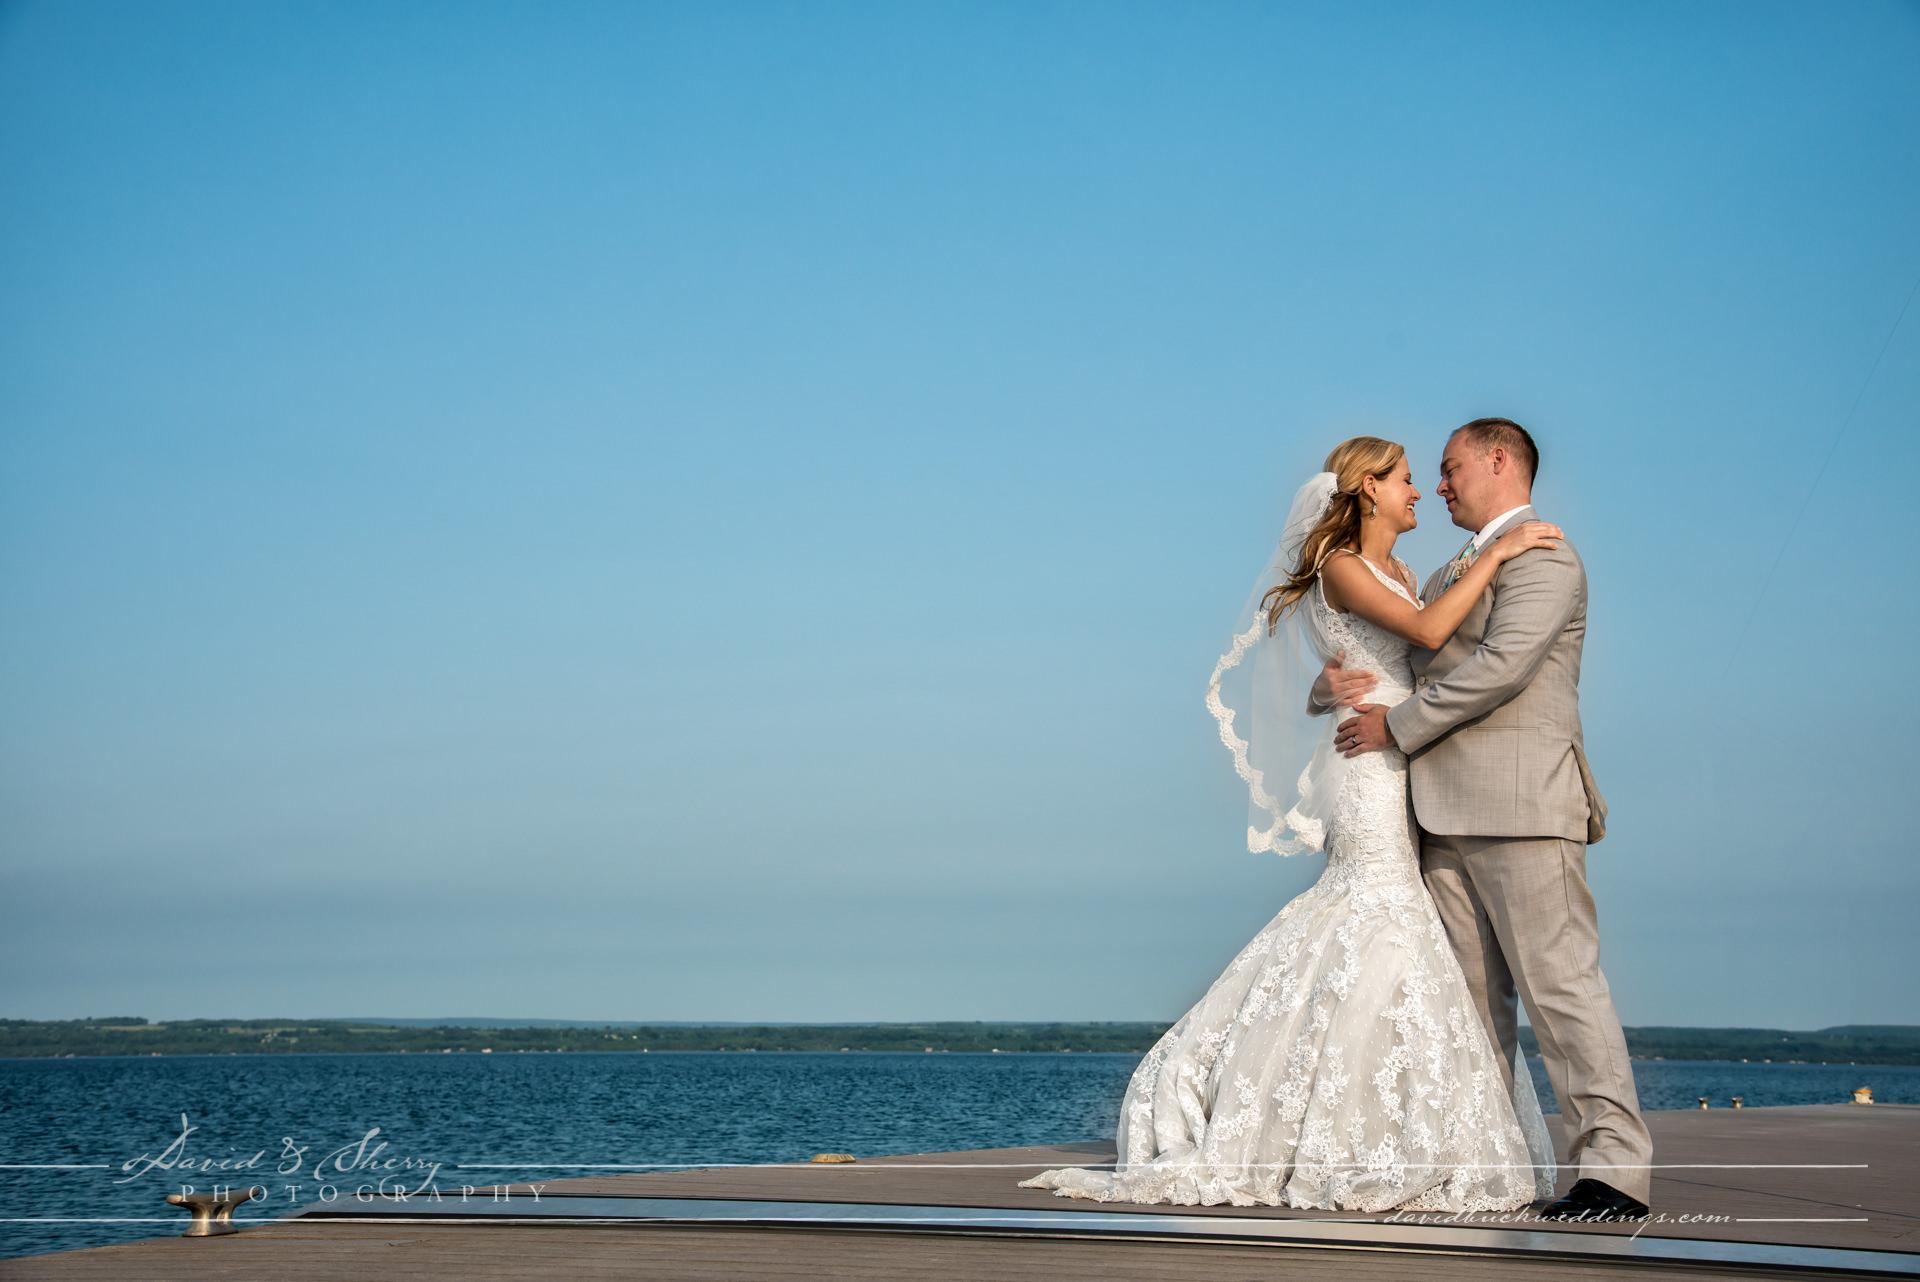 Cobble_Beach_Wedding_Photography_Owen_Sound_36